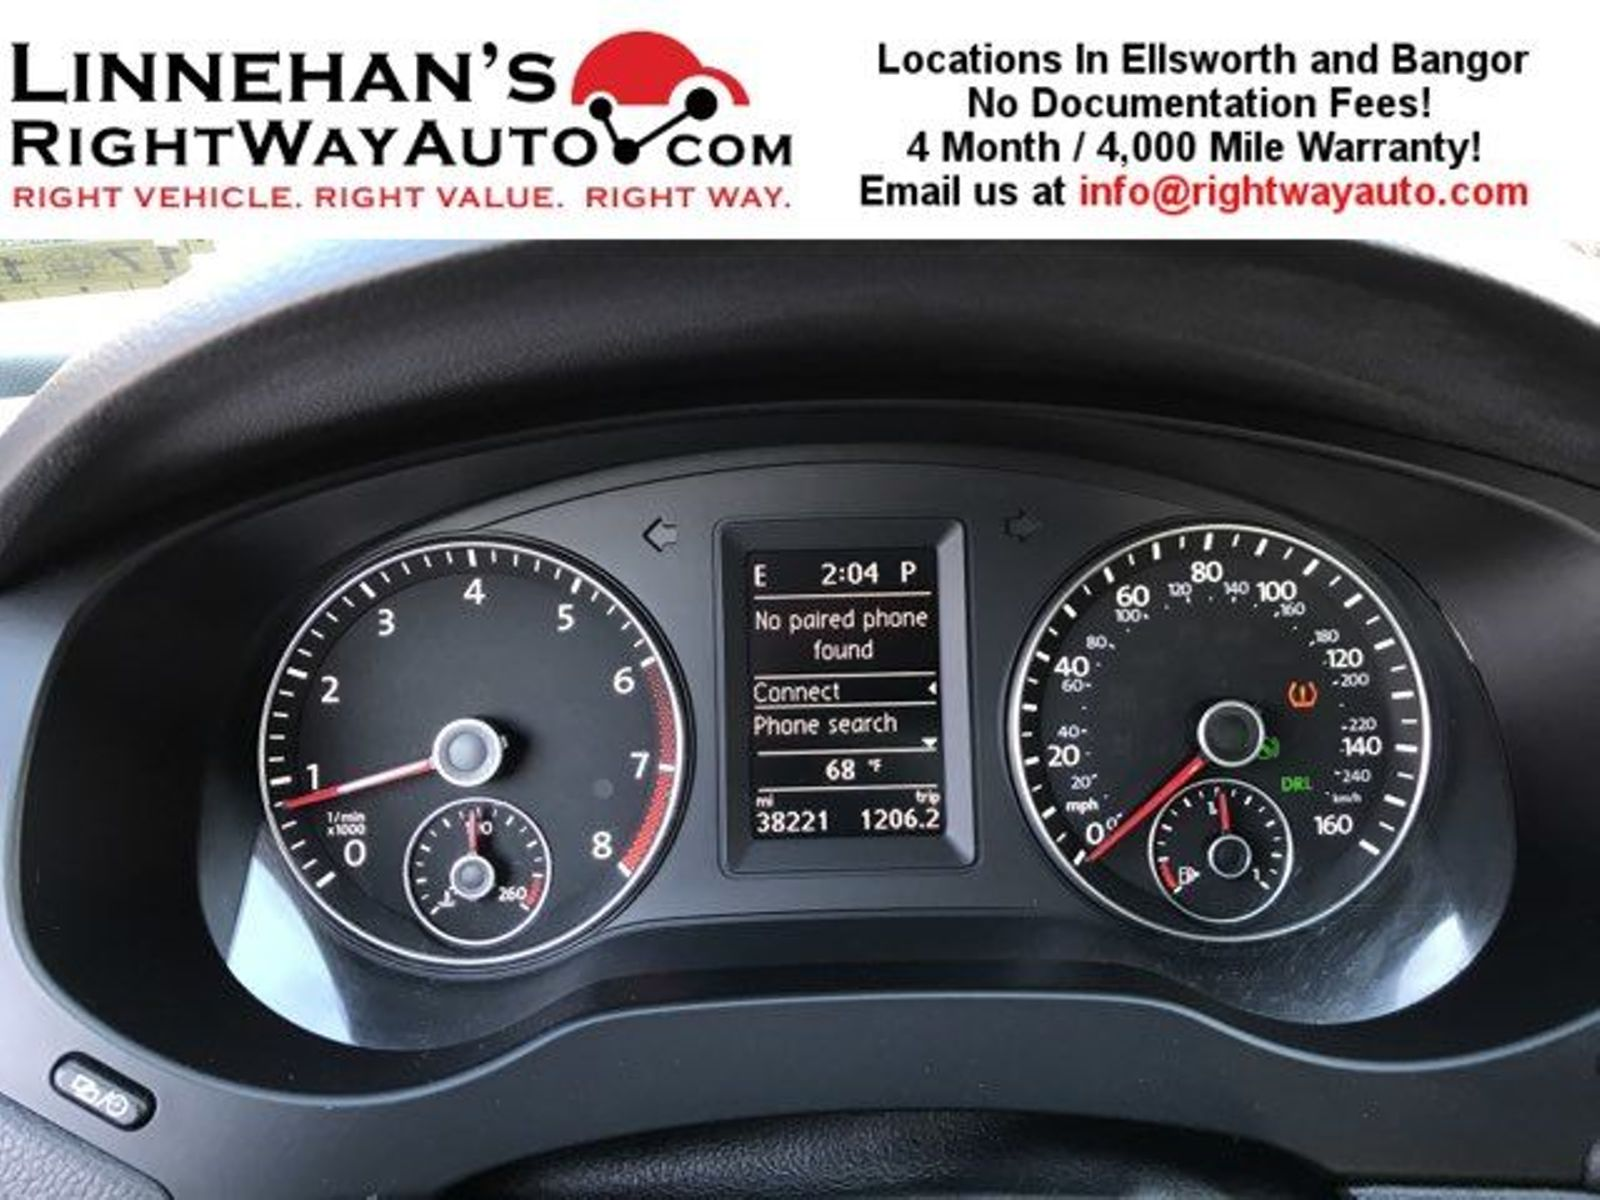 2013 Volkswagen Gli Chrysler 200 Fuel Filter In Bangor